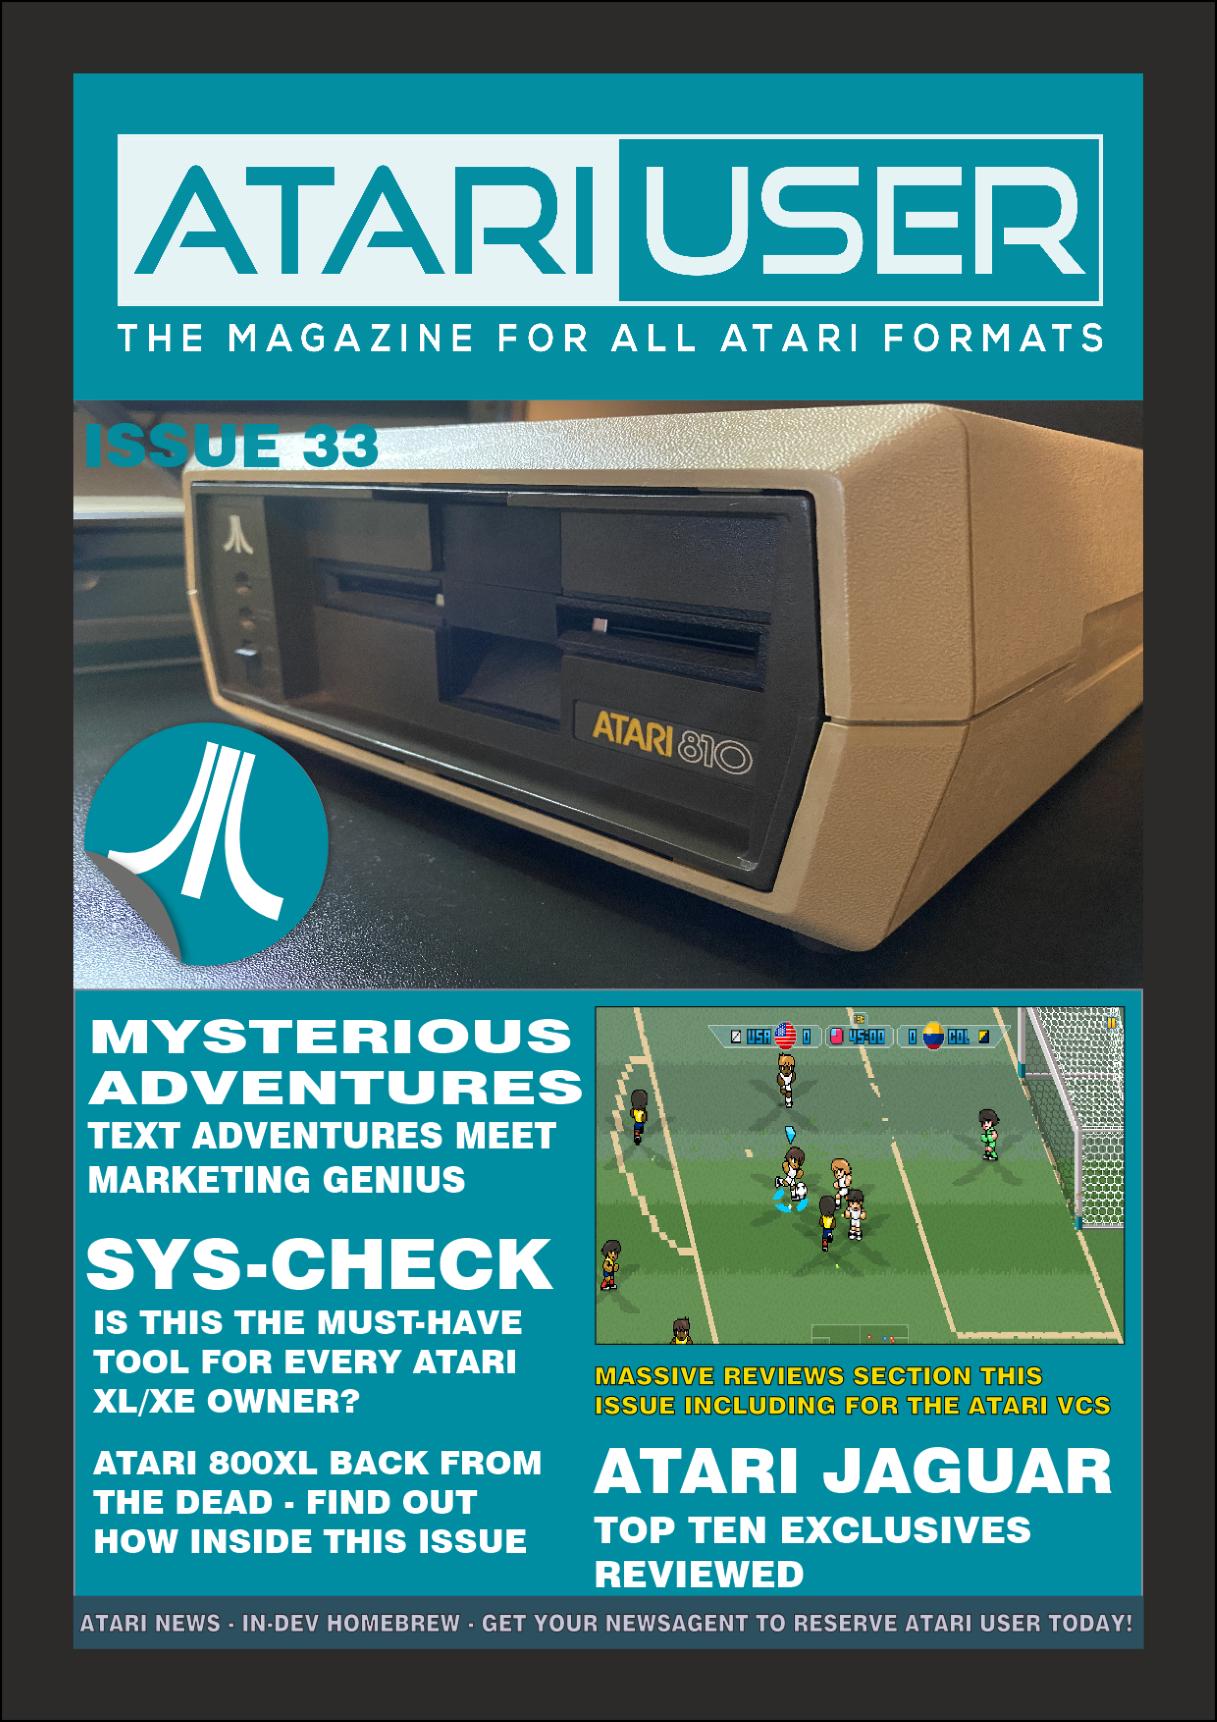 Atari User Magazine Issue 33